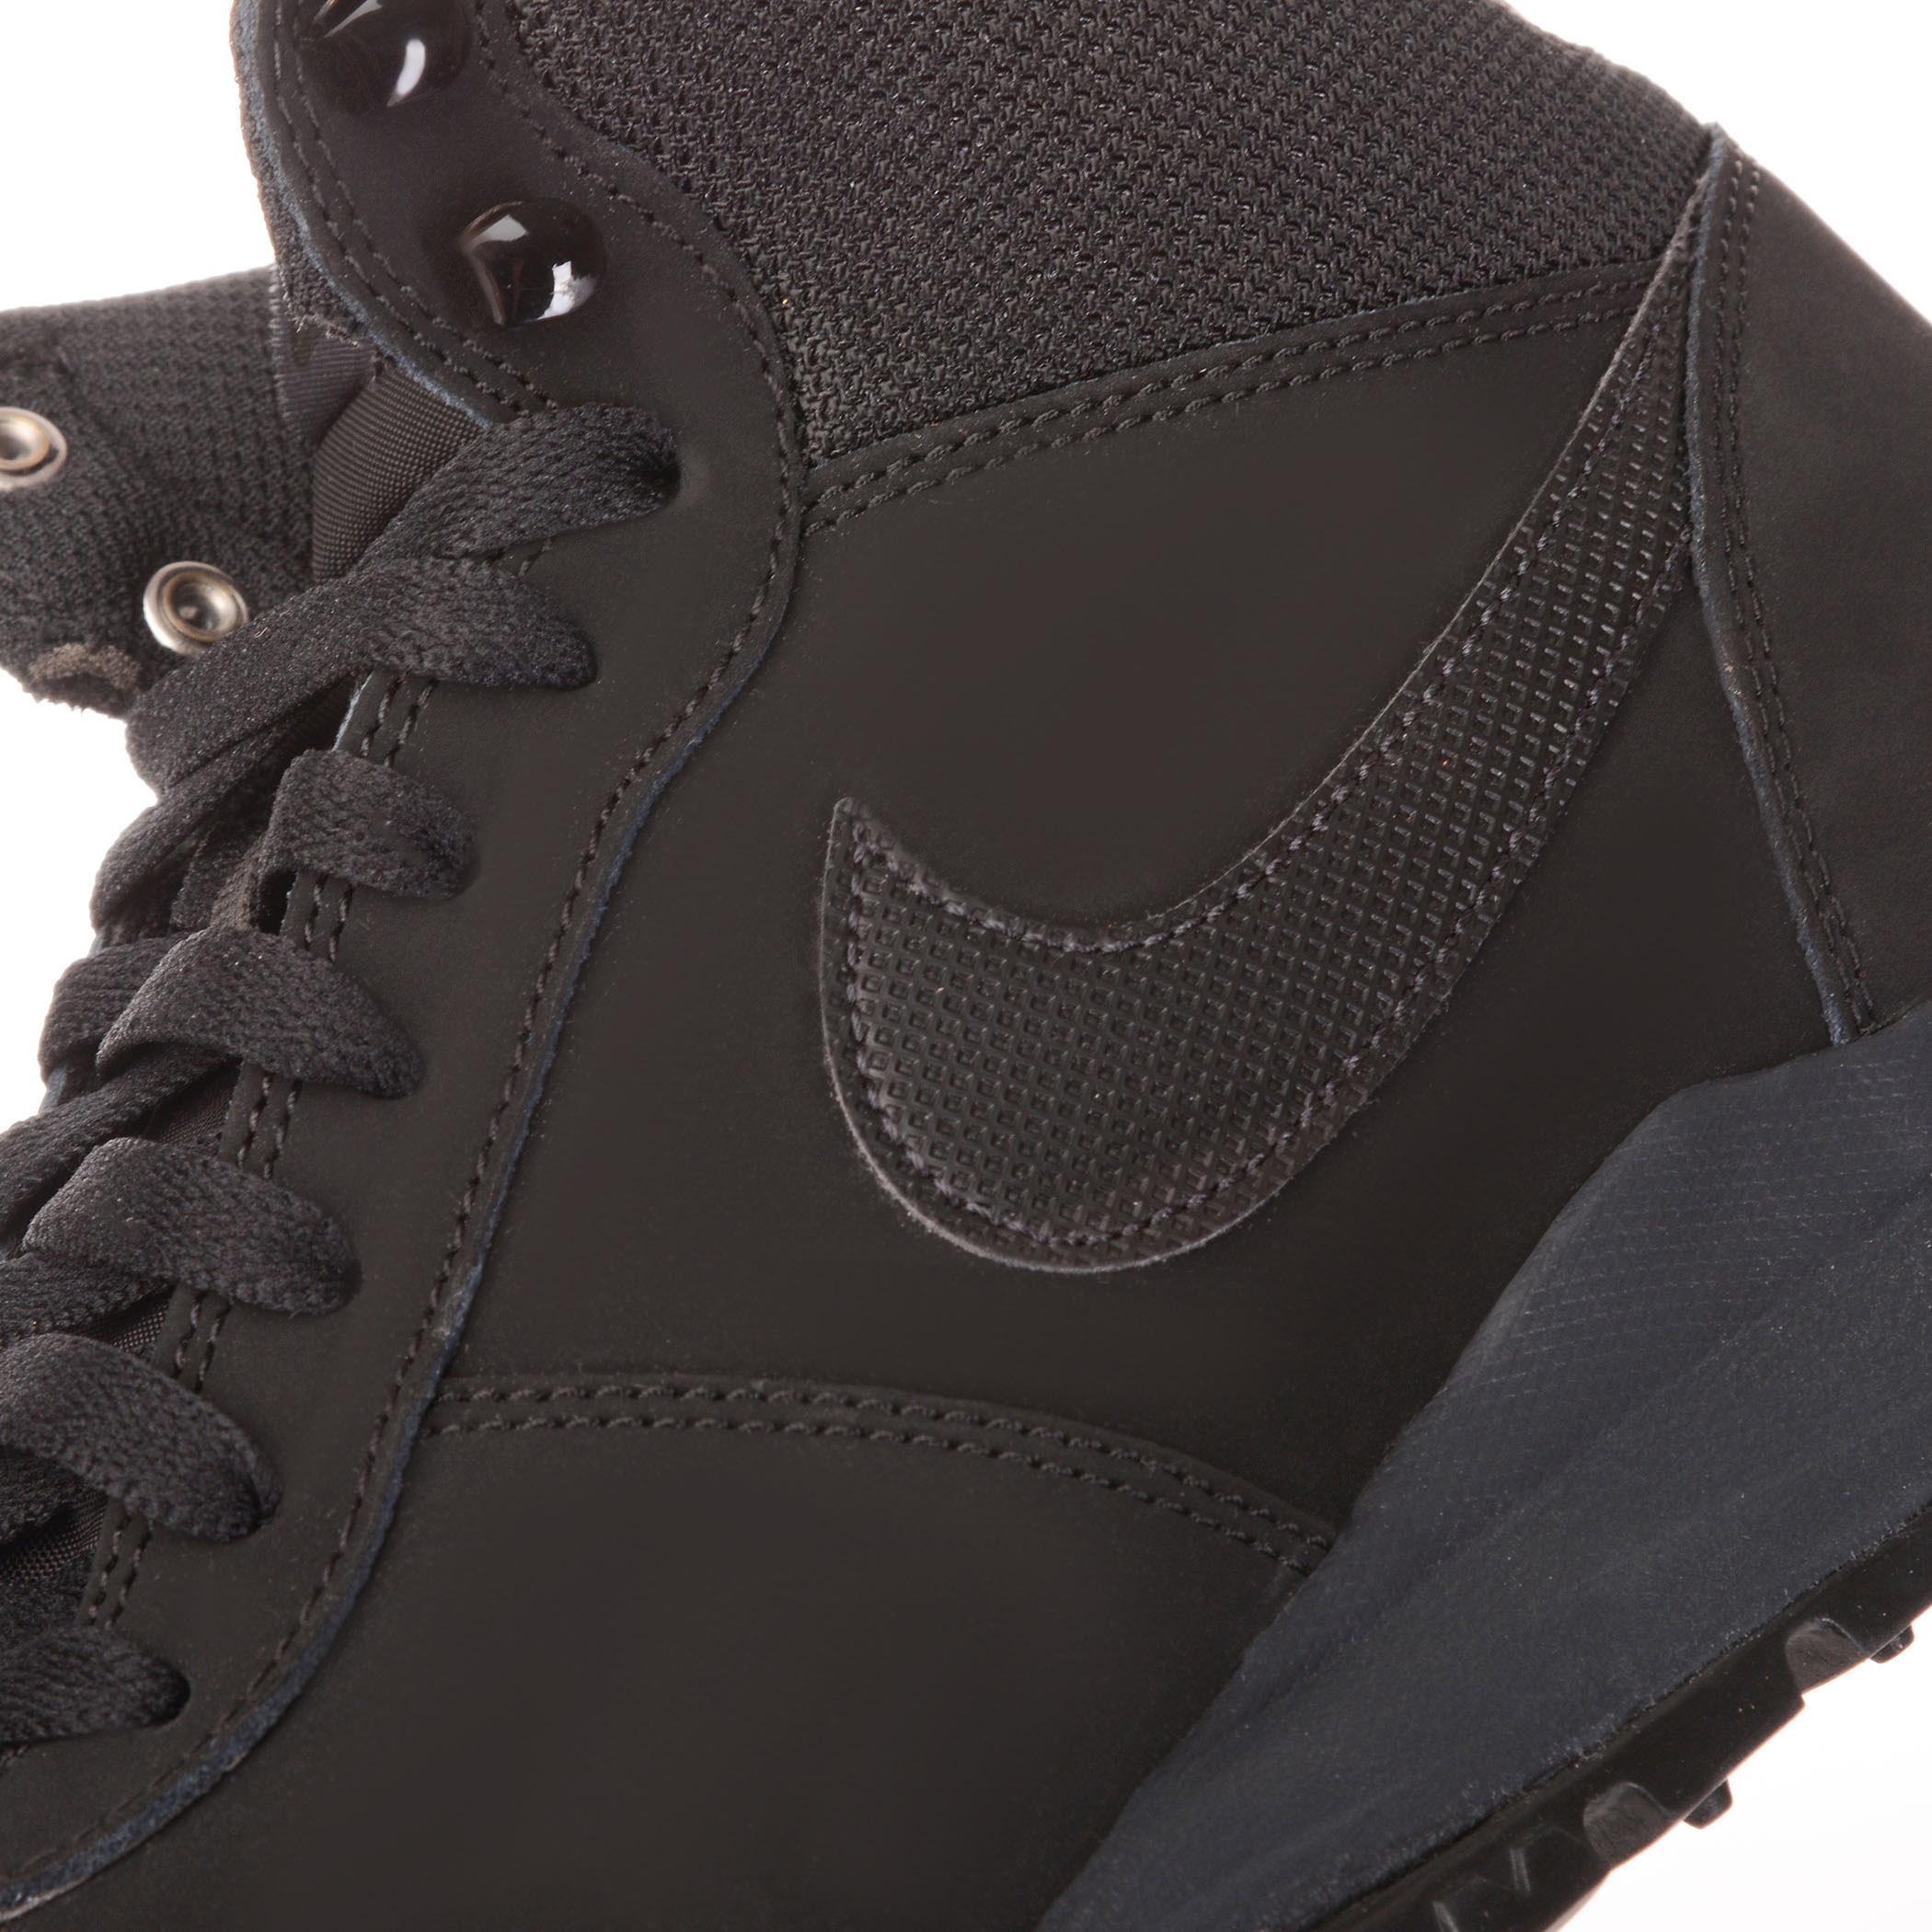 71ed4fba Мужские ботинки Nike Hoodland Suede Black/Black-Anthracite - фото 7